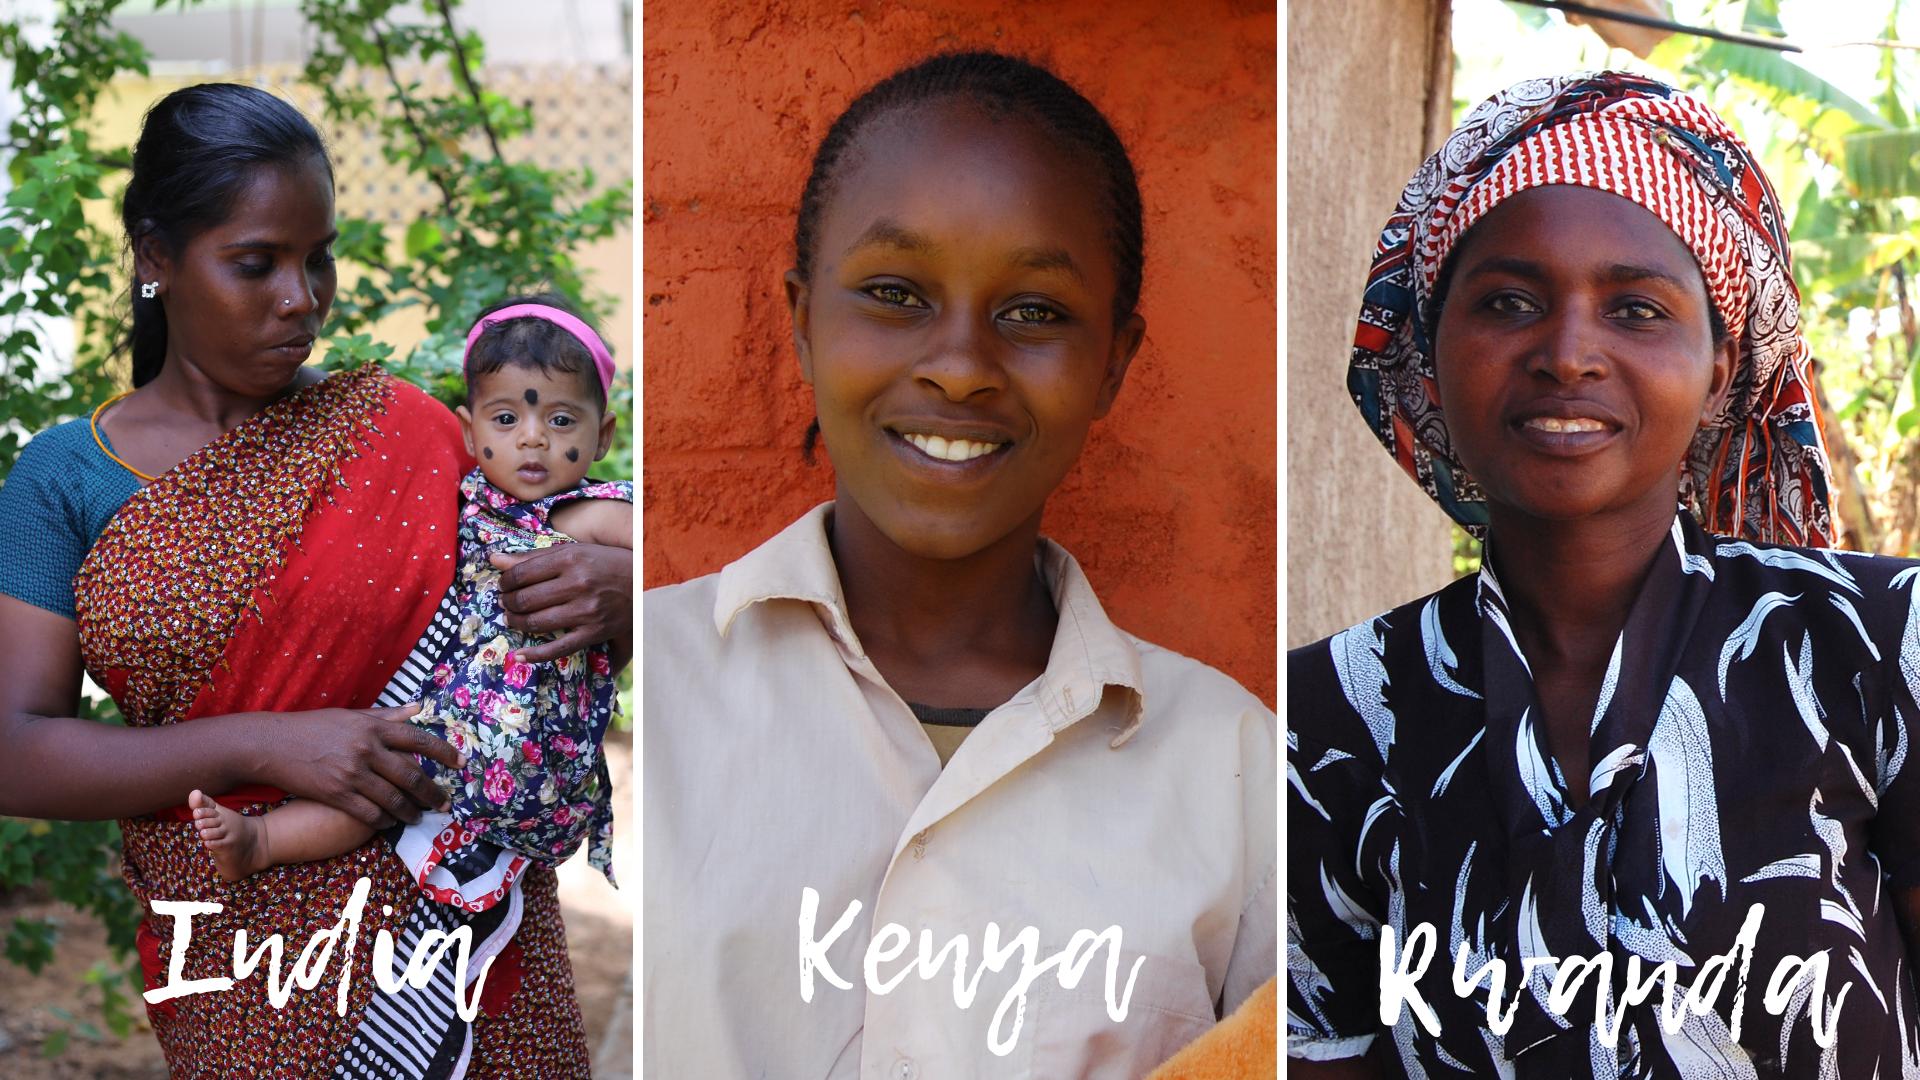 SheHopes India, Kenya, Rwanda 1.png